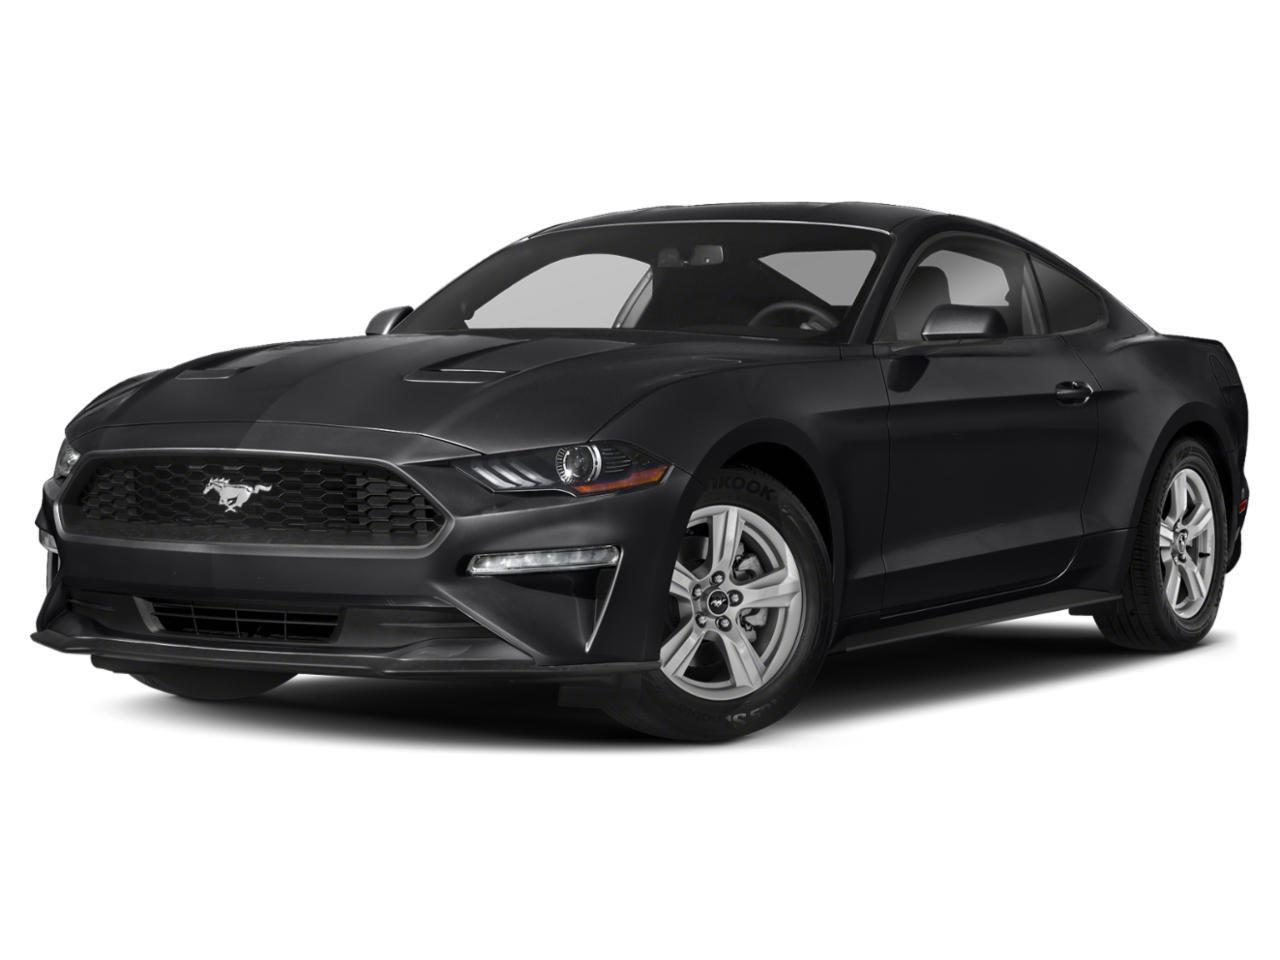 Shadow Black 2020 Ford Mustang GT 2dr Car Winston-Salem NC